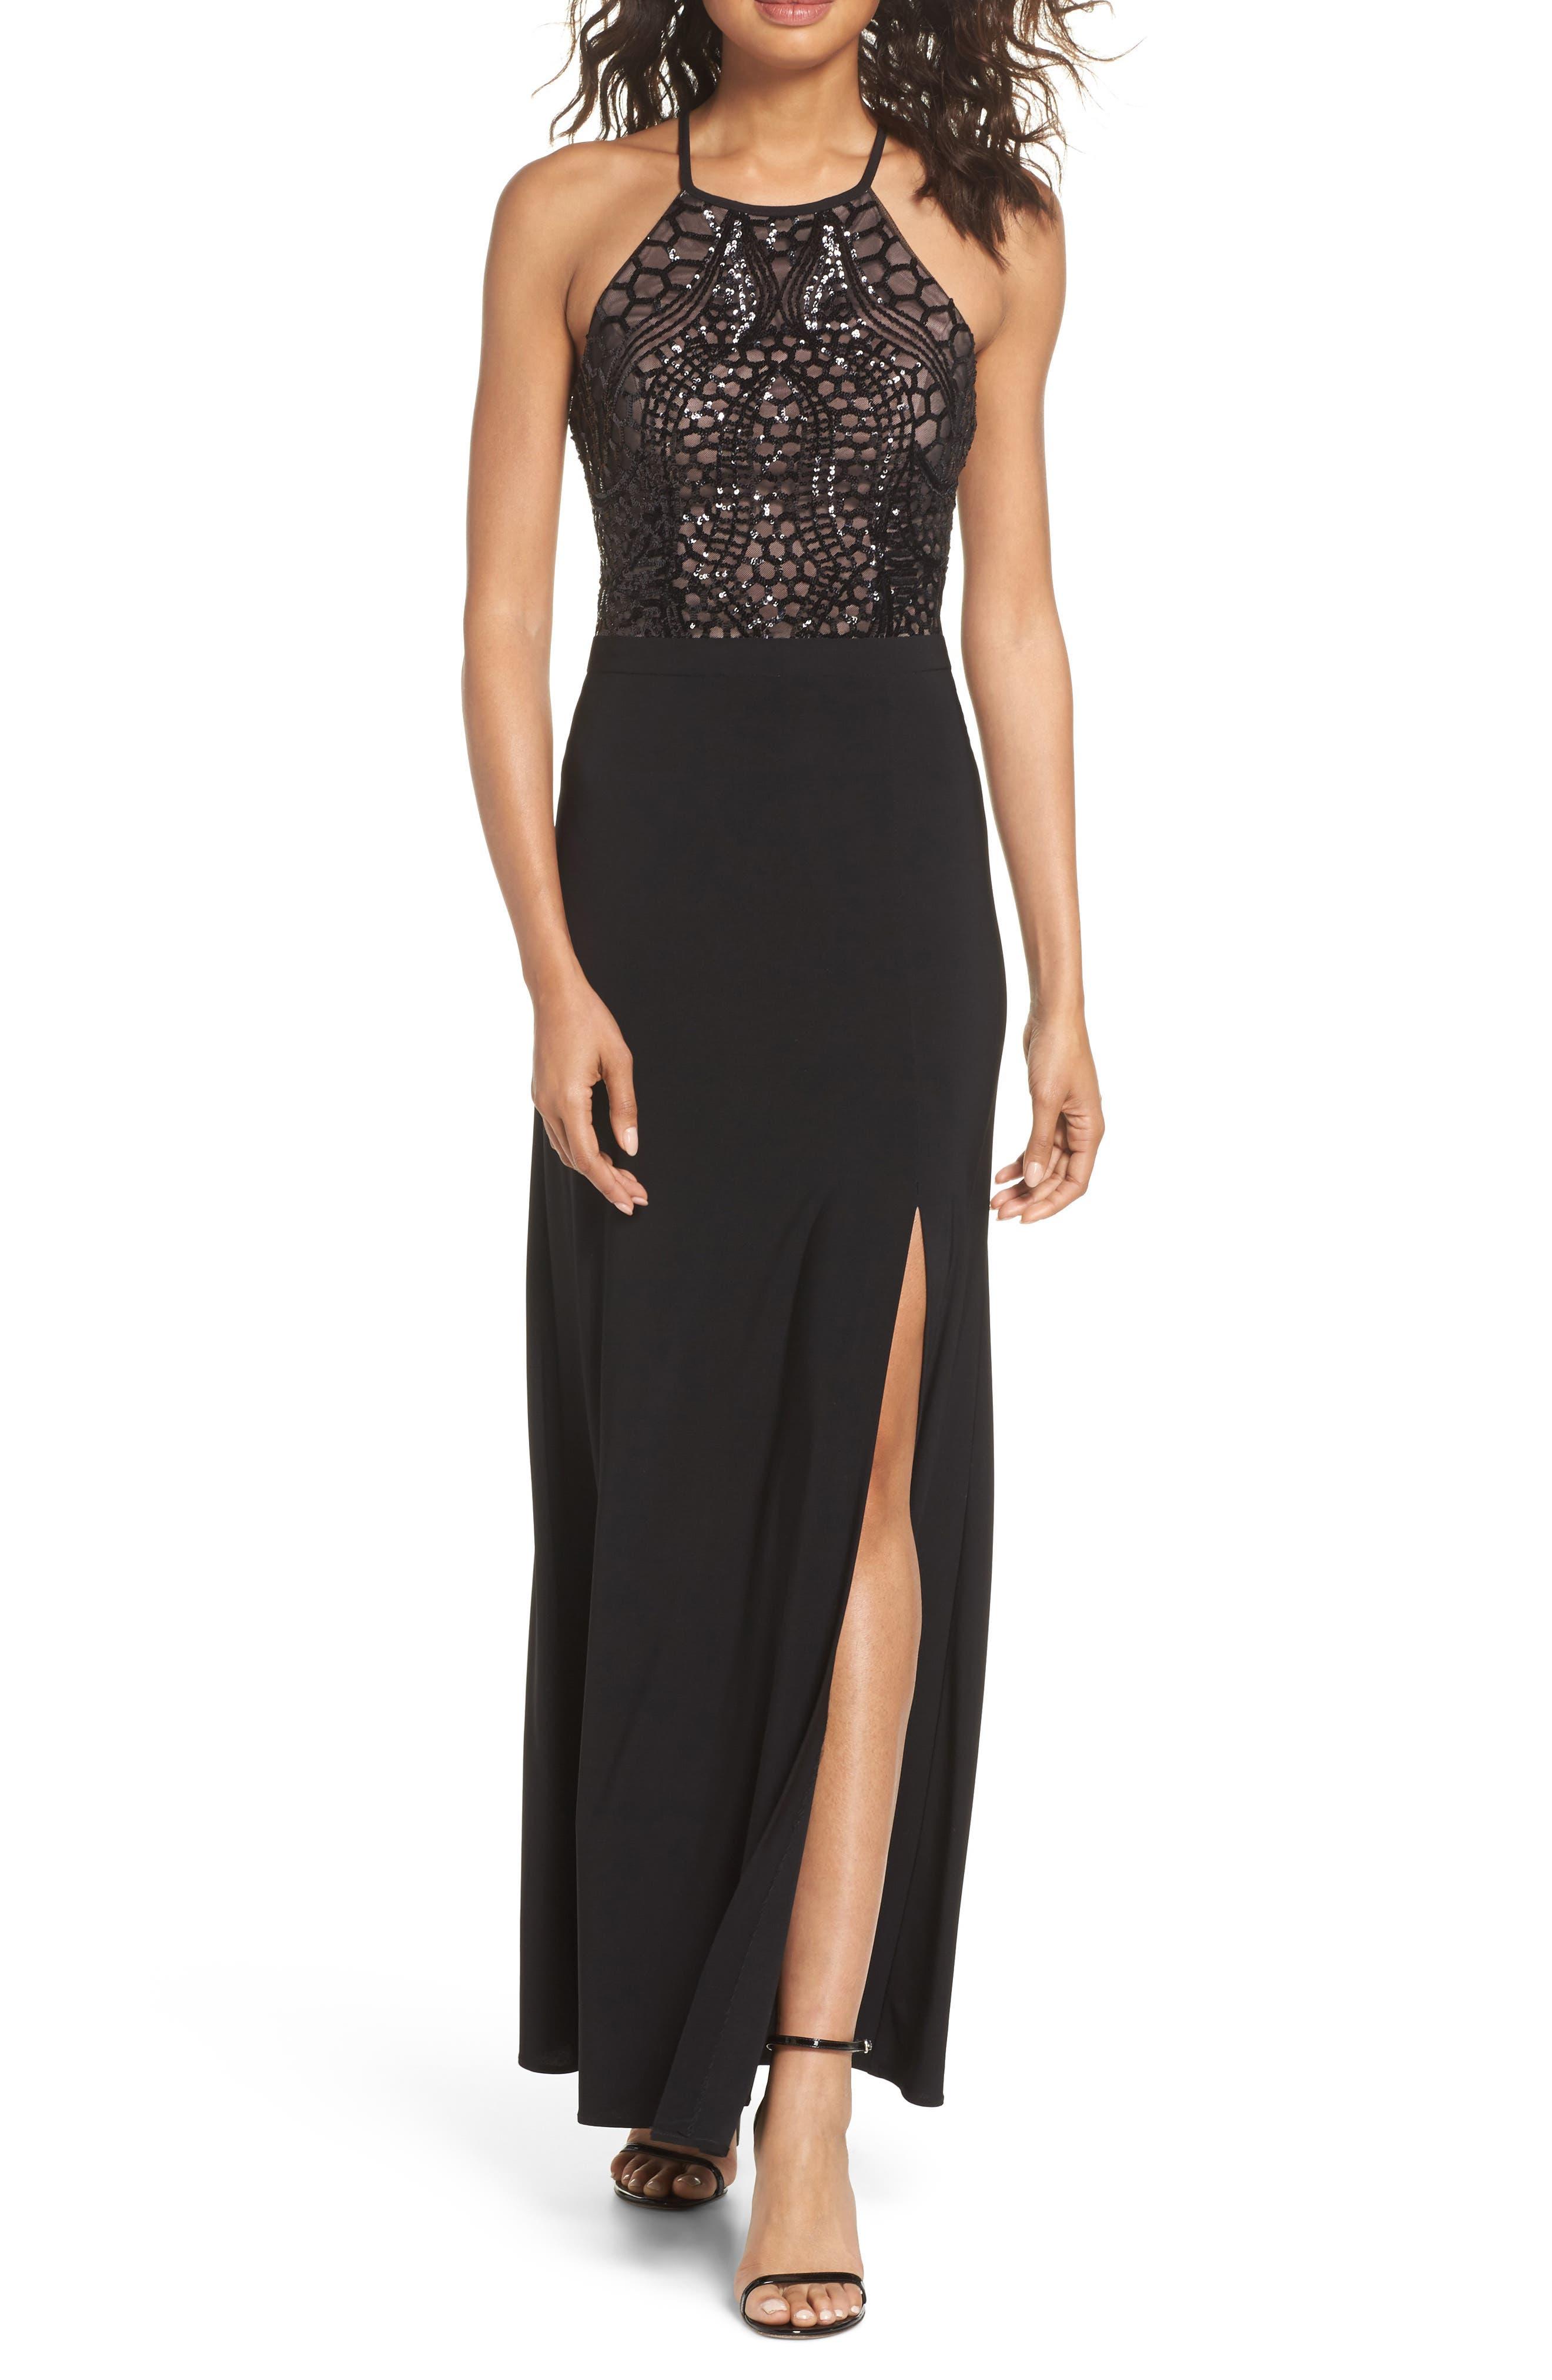 Morgan & Co. Sequin Halter Gown, /12 - Black